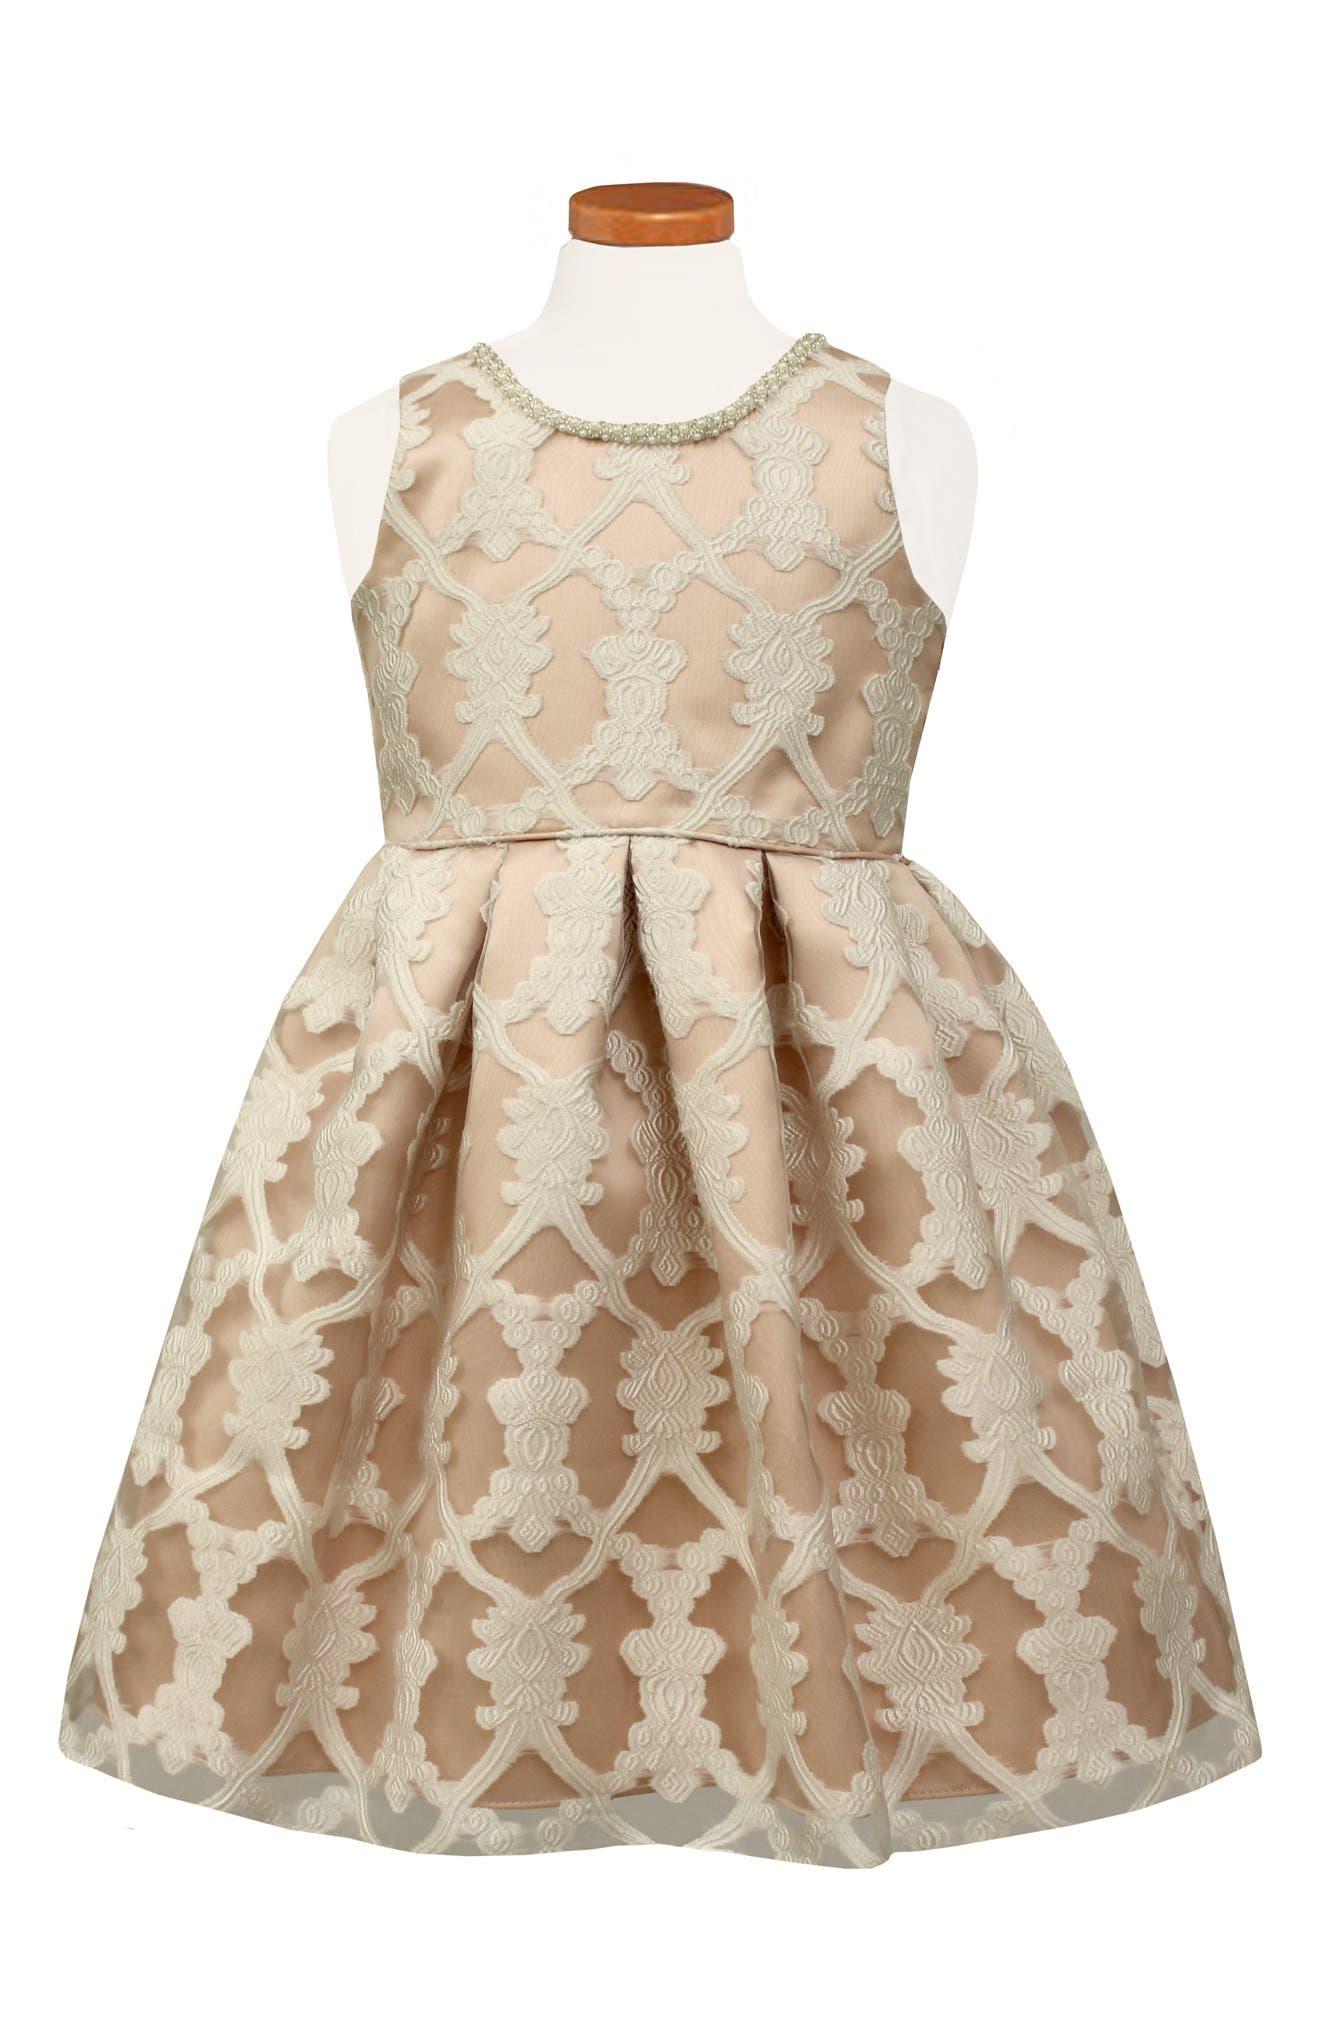 Sorbet Burnout Lace Party Dress (Toddler Girls, Little Girls & Big Girls)